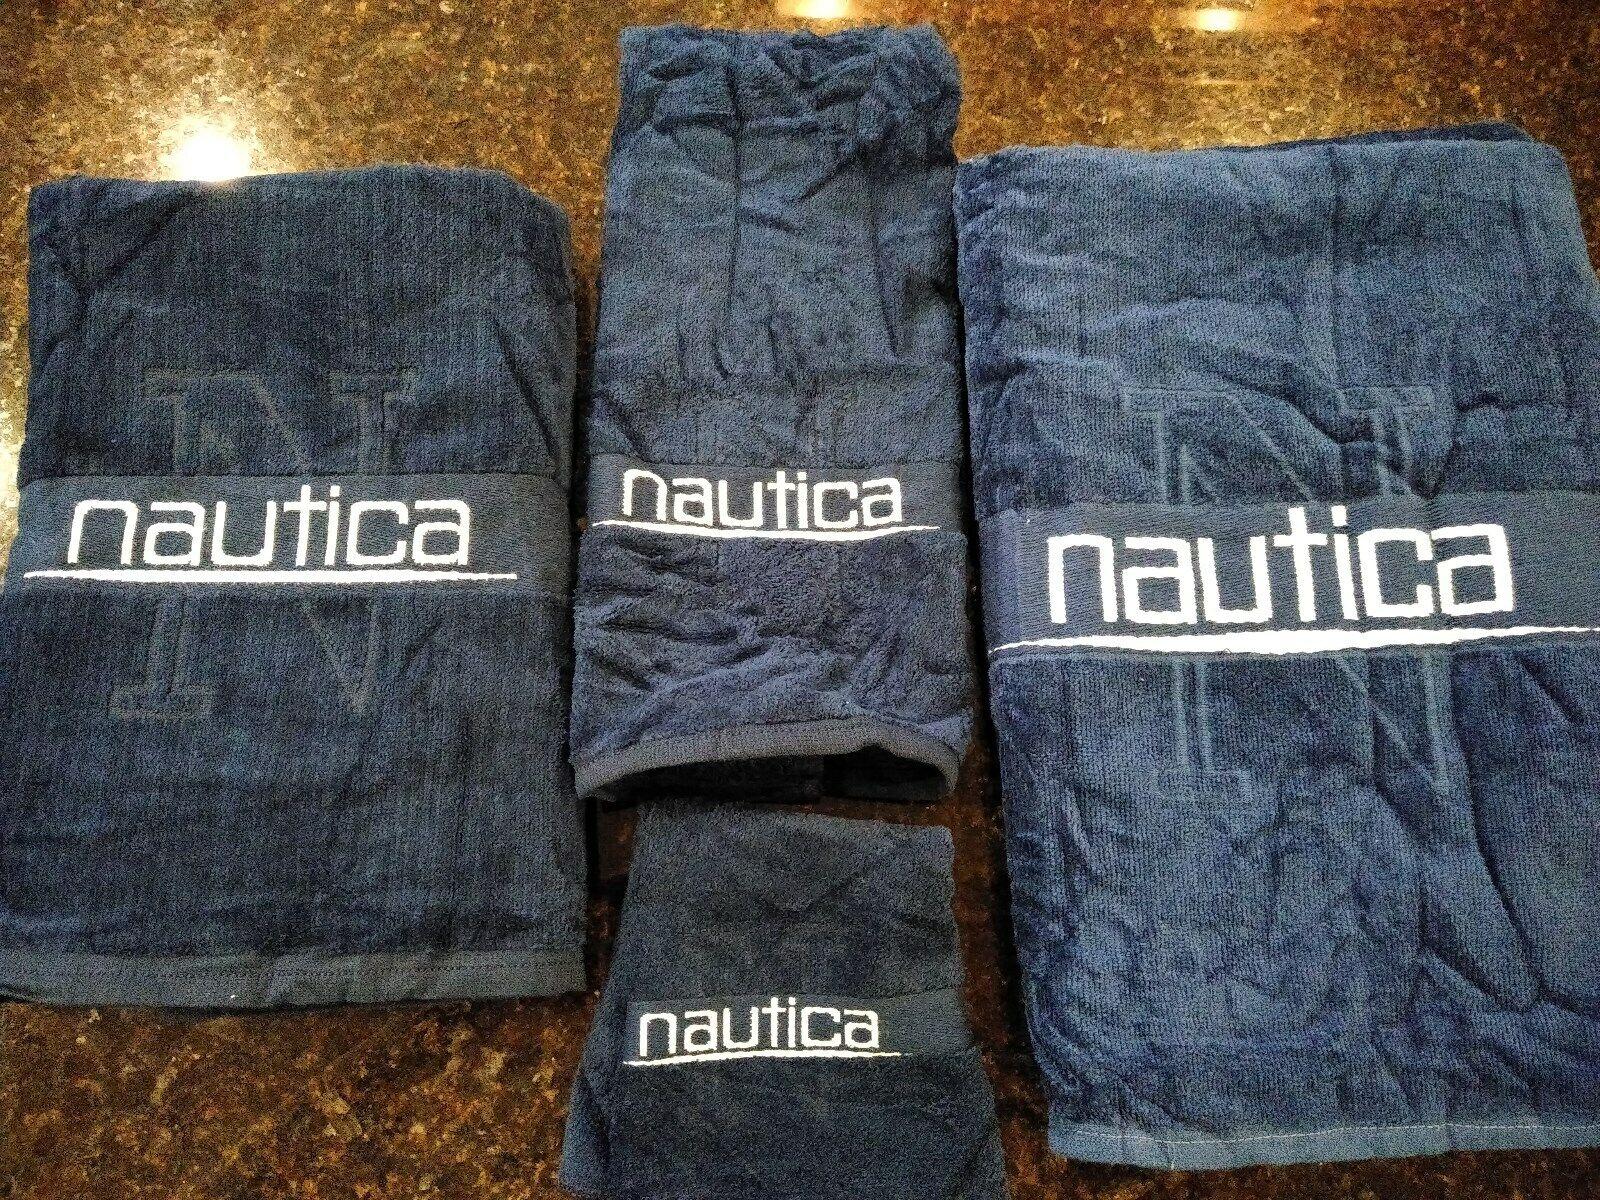 NAUTICA SCULPTED LOGO NAVY BLUE & WHITE TOWEL SET:BATH/WASHC